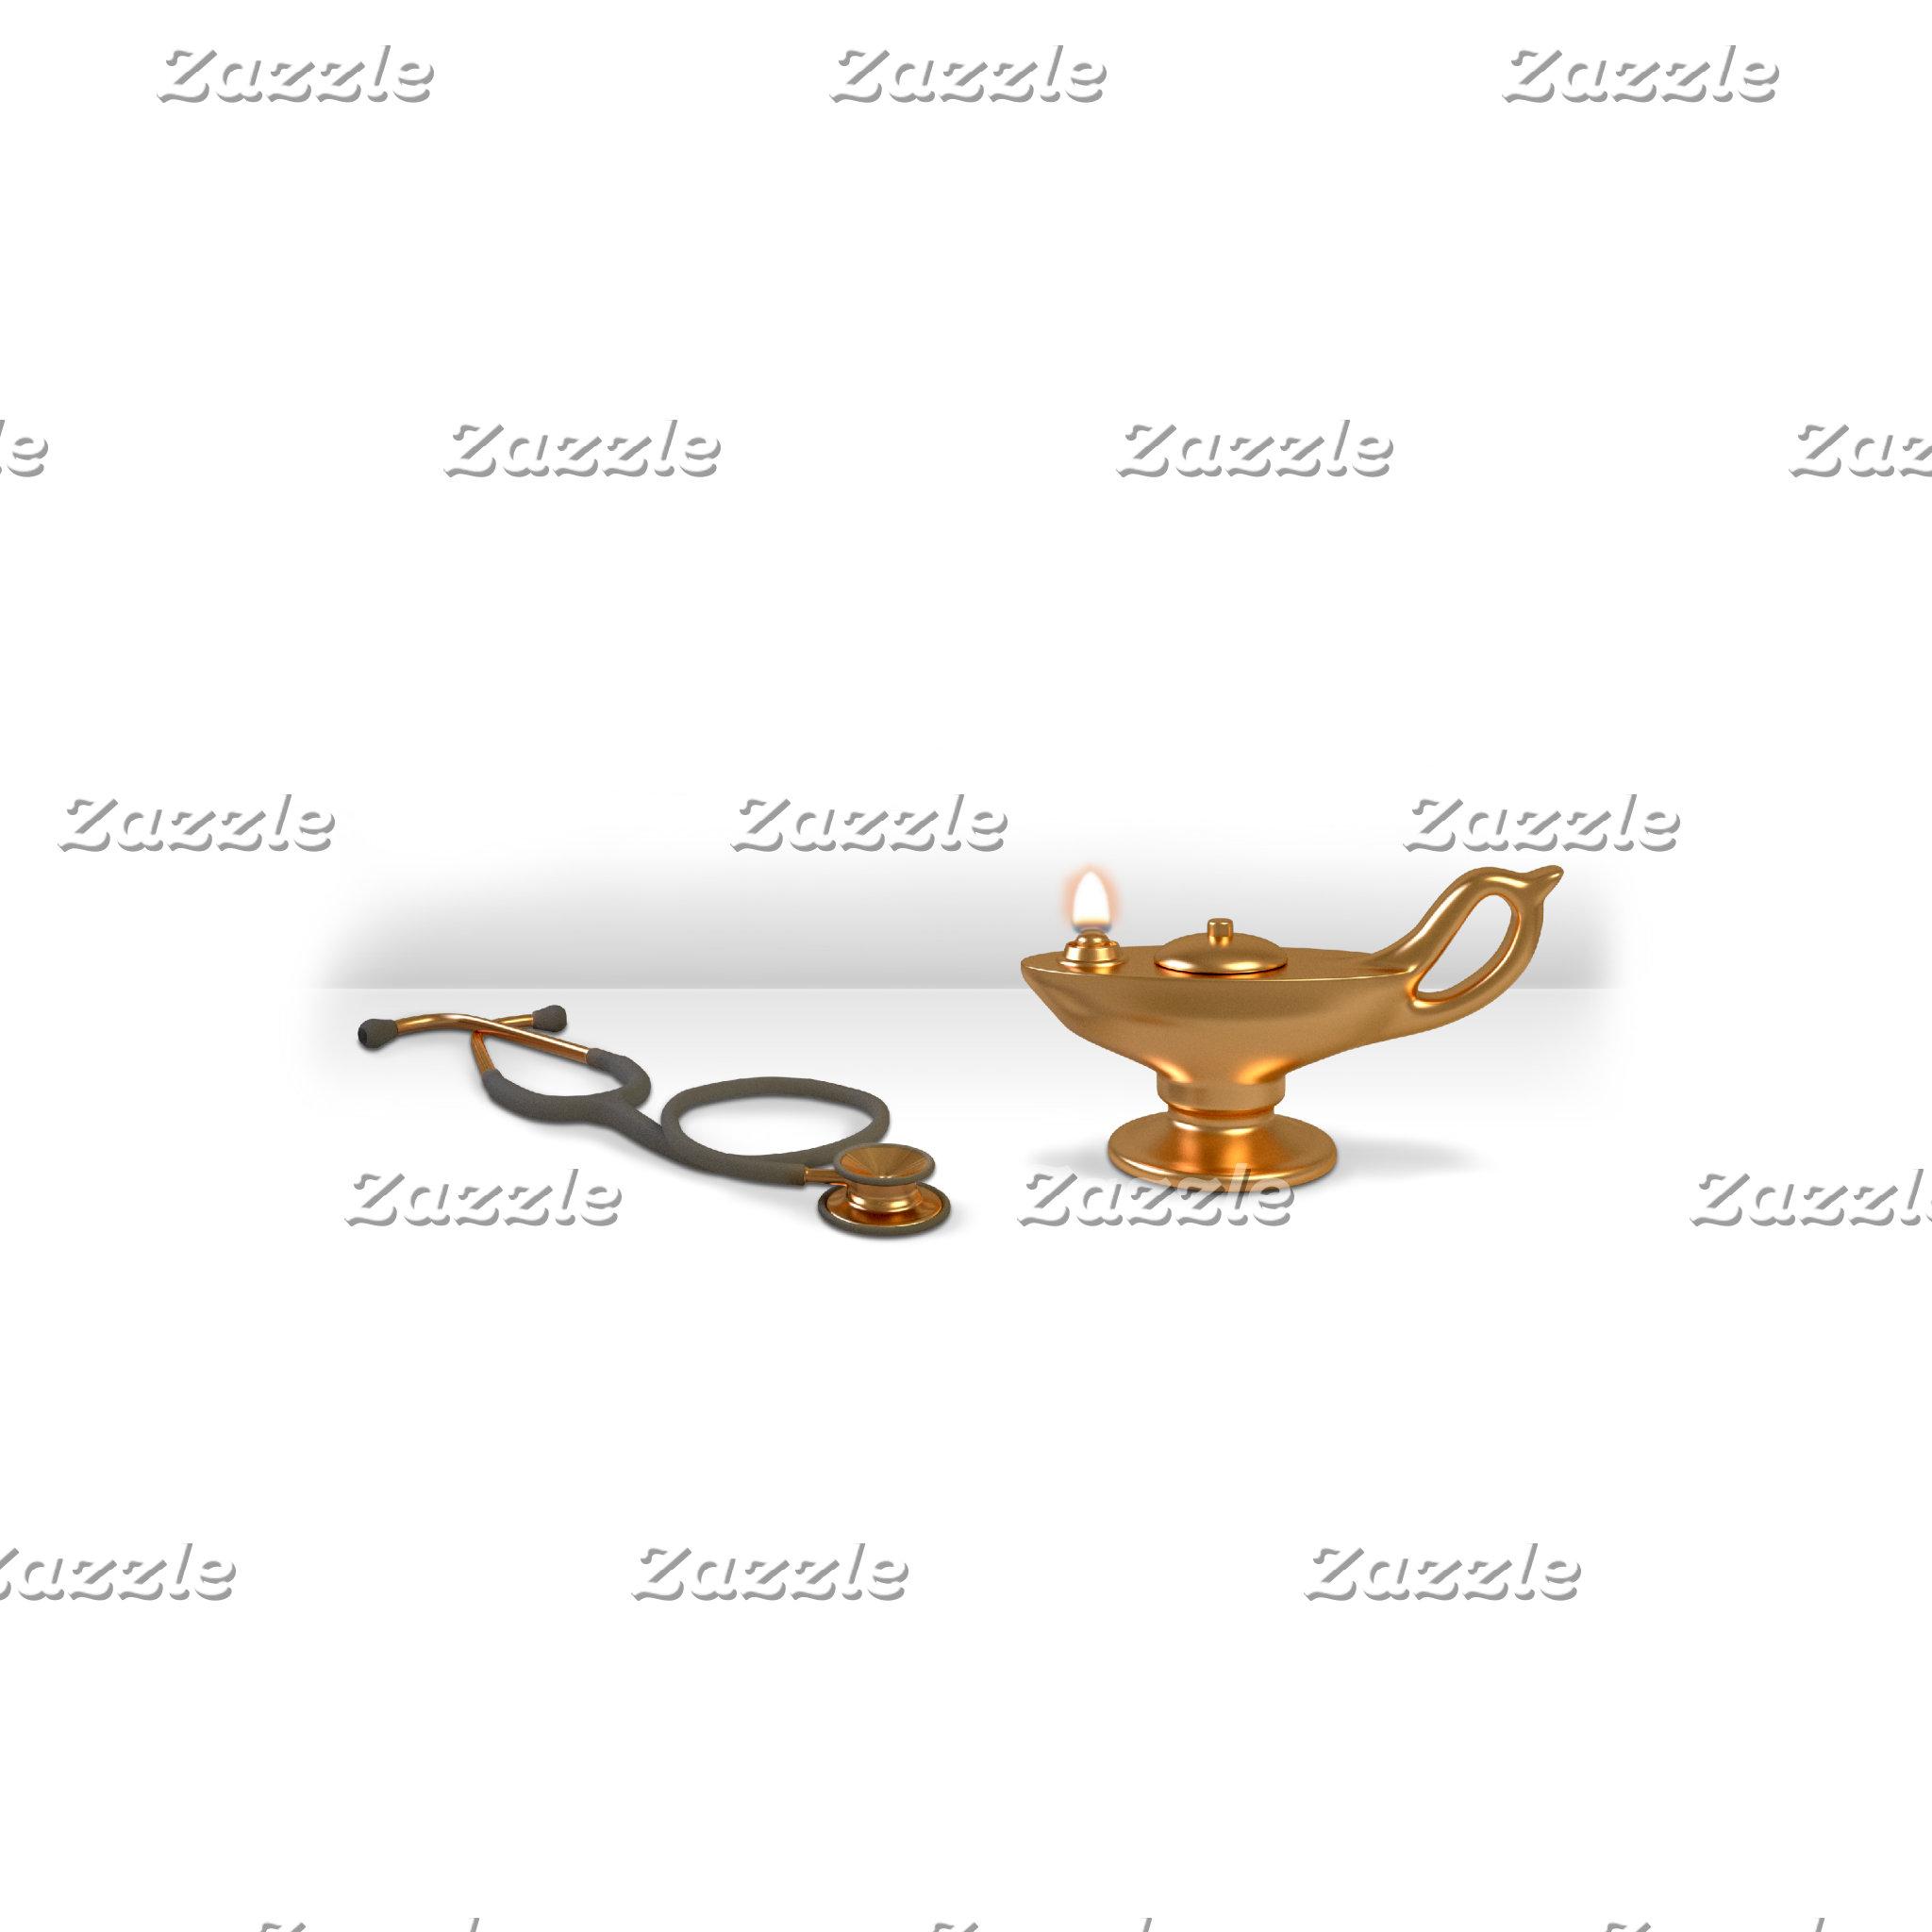 Nursing Lamp And Stethoscope